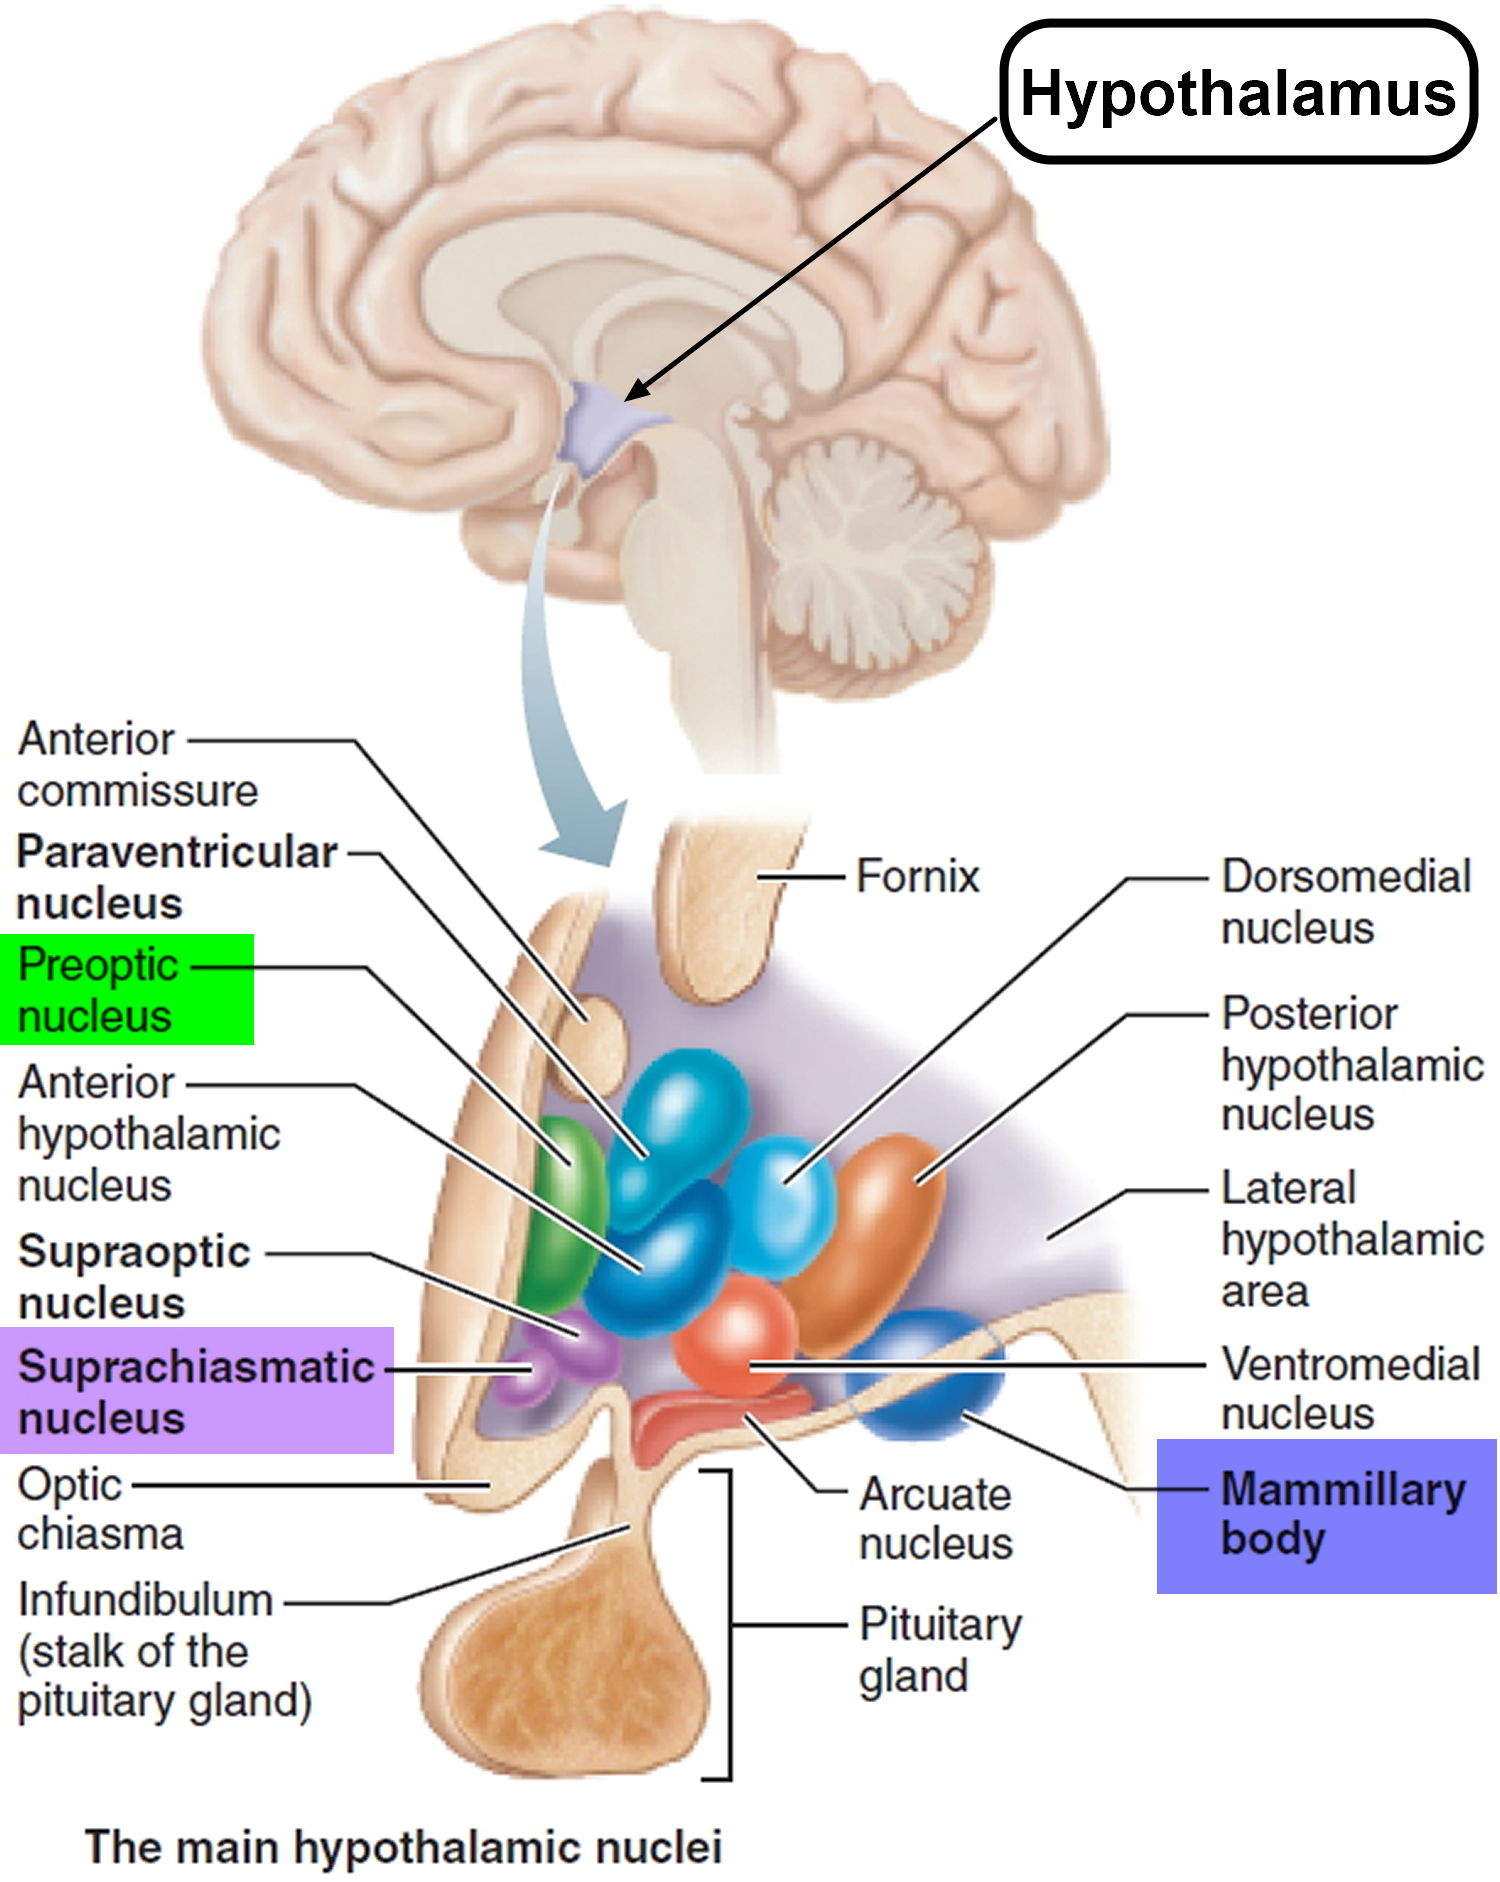 hypothalamus - suprachiasmatic nucleus